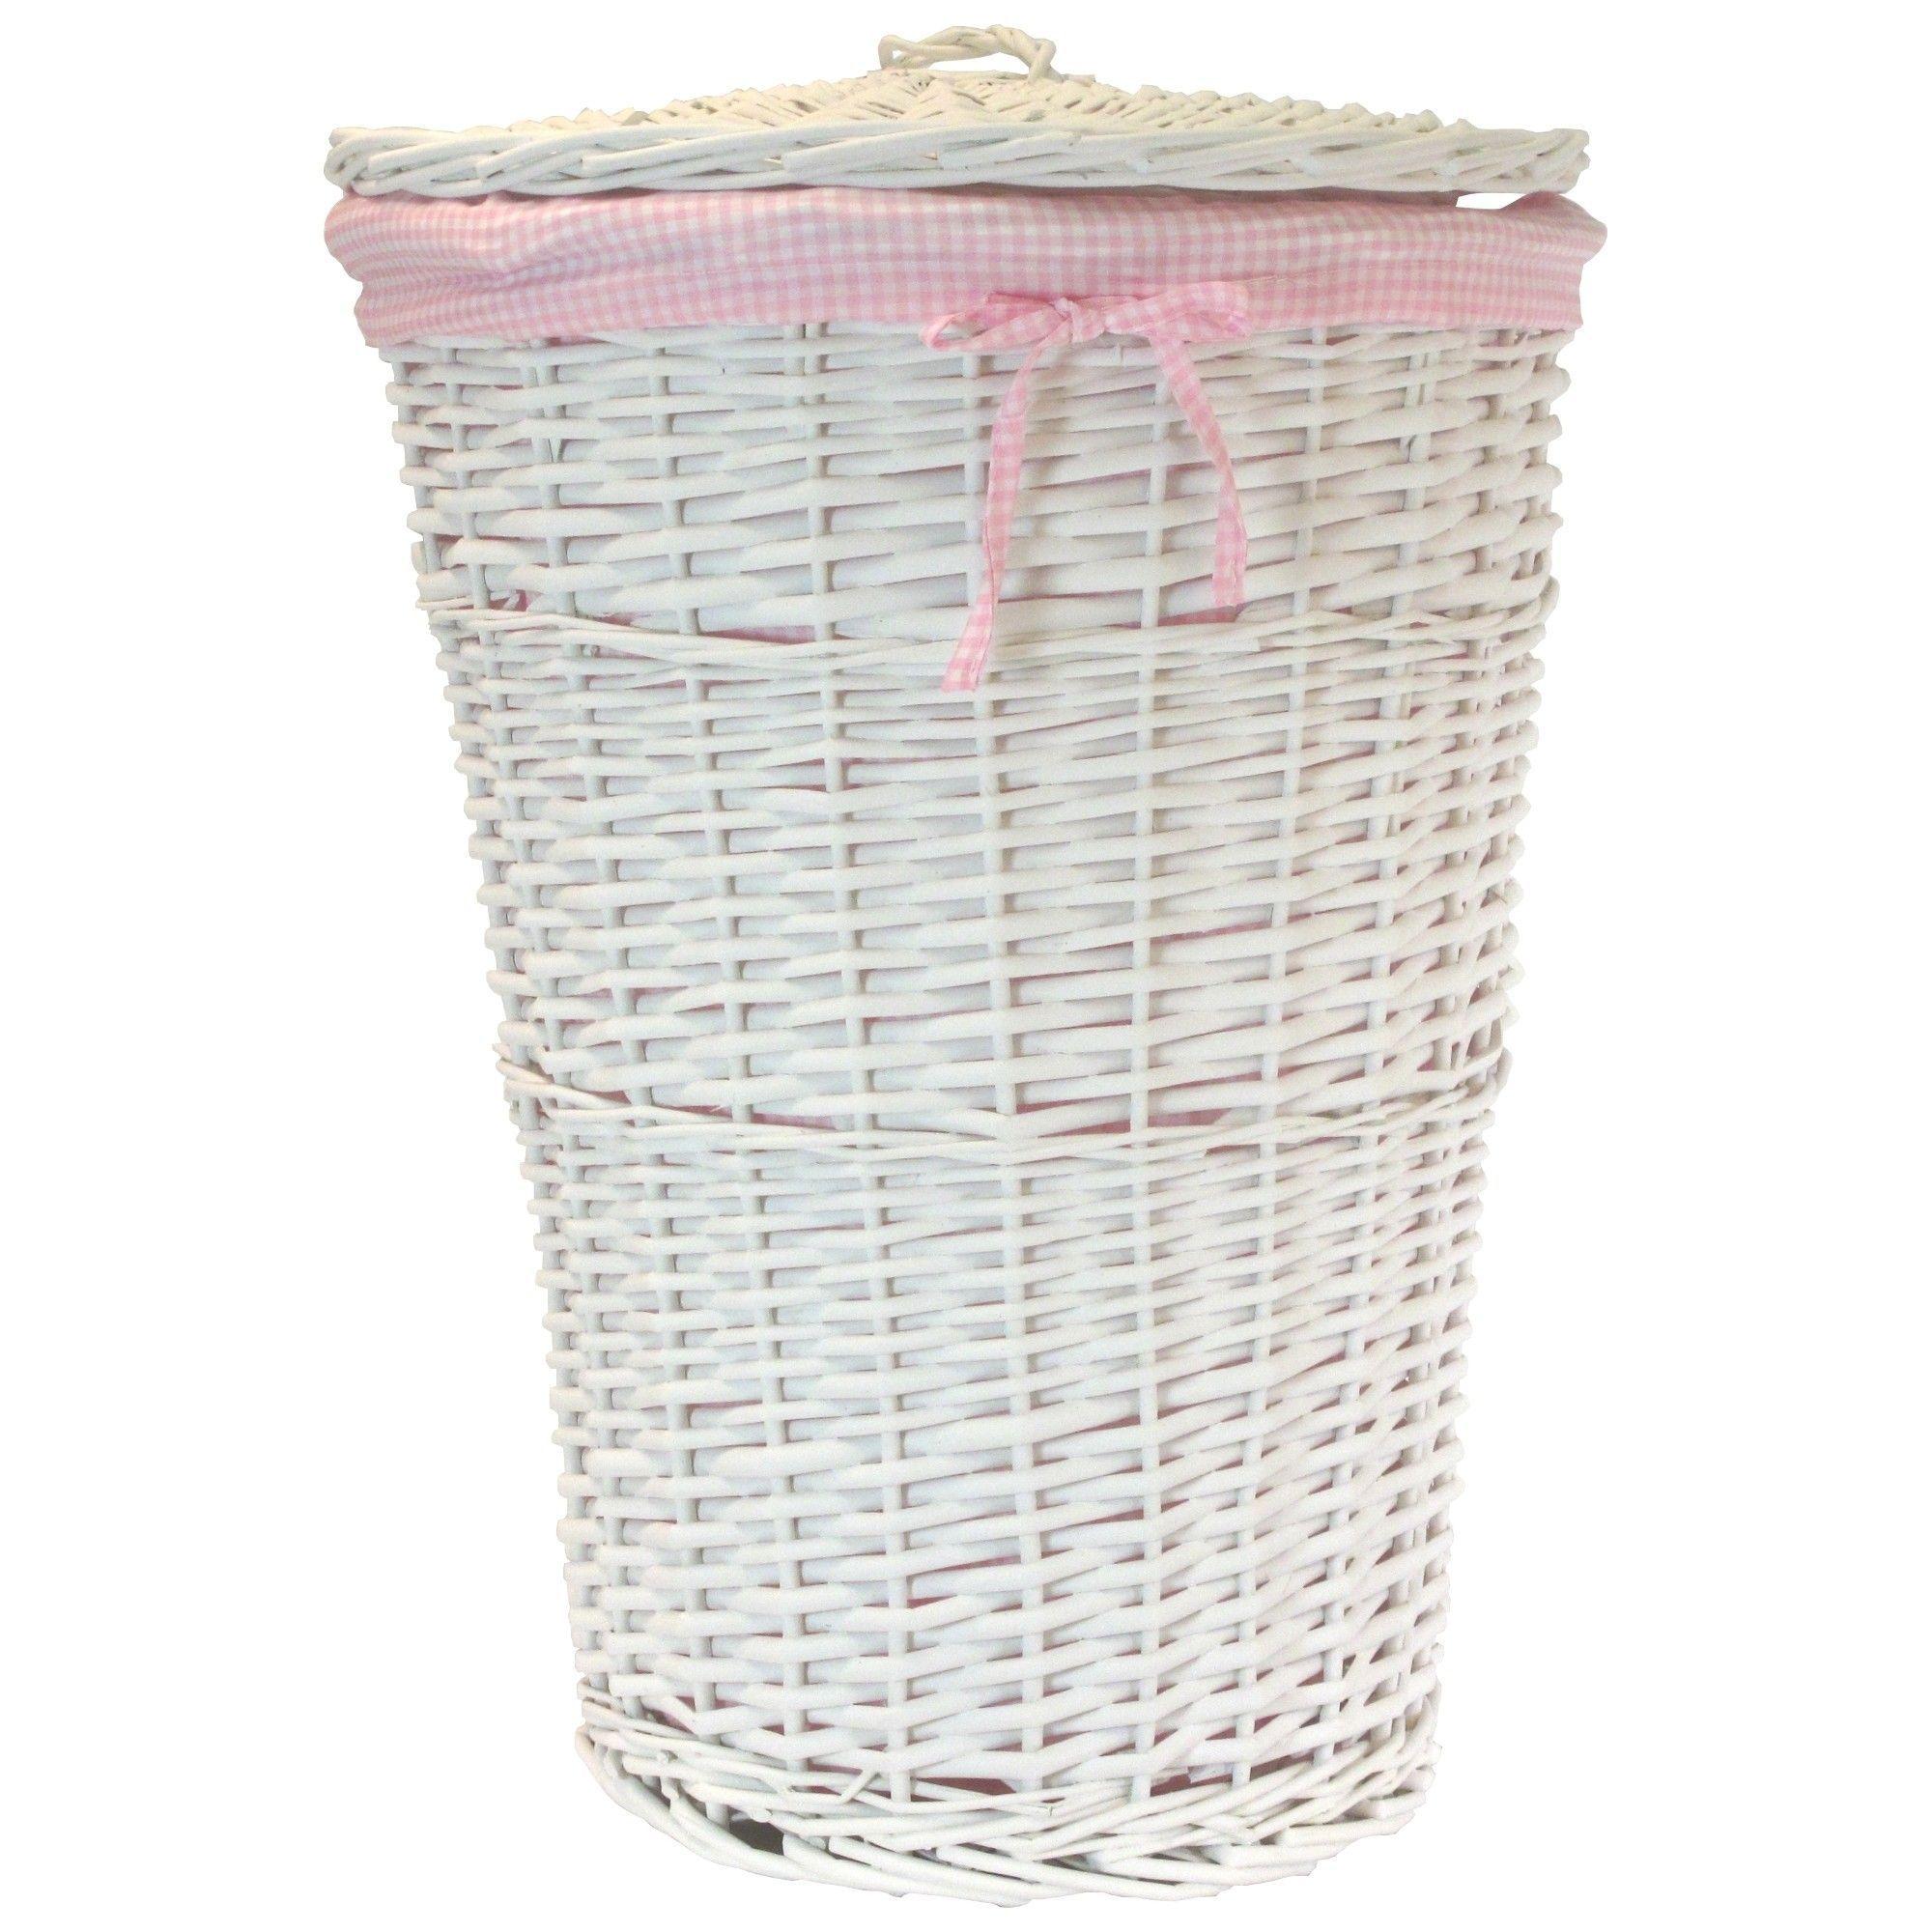 Shianne Hamper Liner Laundry Hamper Wicker Laundry Hamper